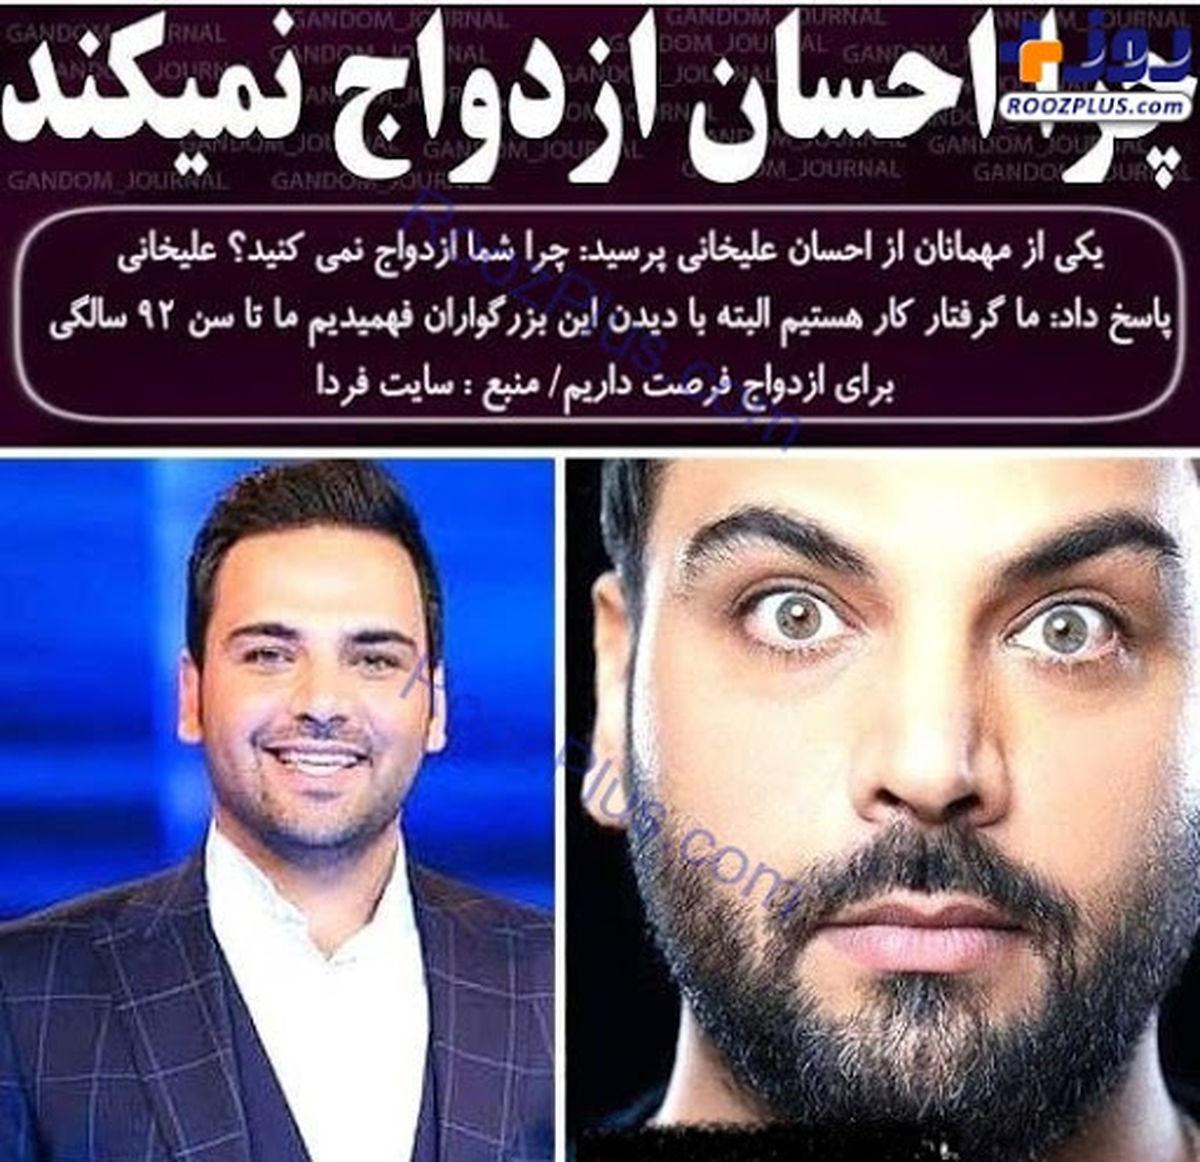 علت ازدواج نکردن احسان علیخانی لو رفت + عکس